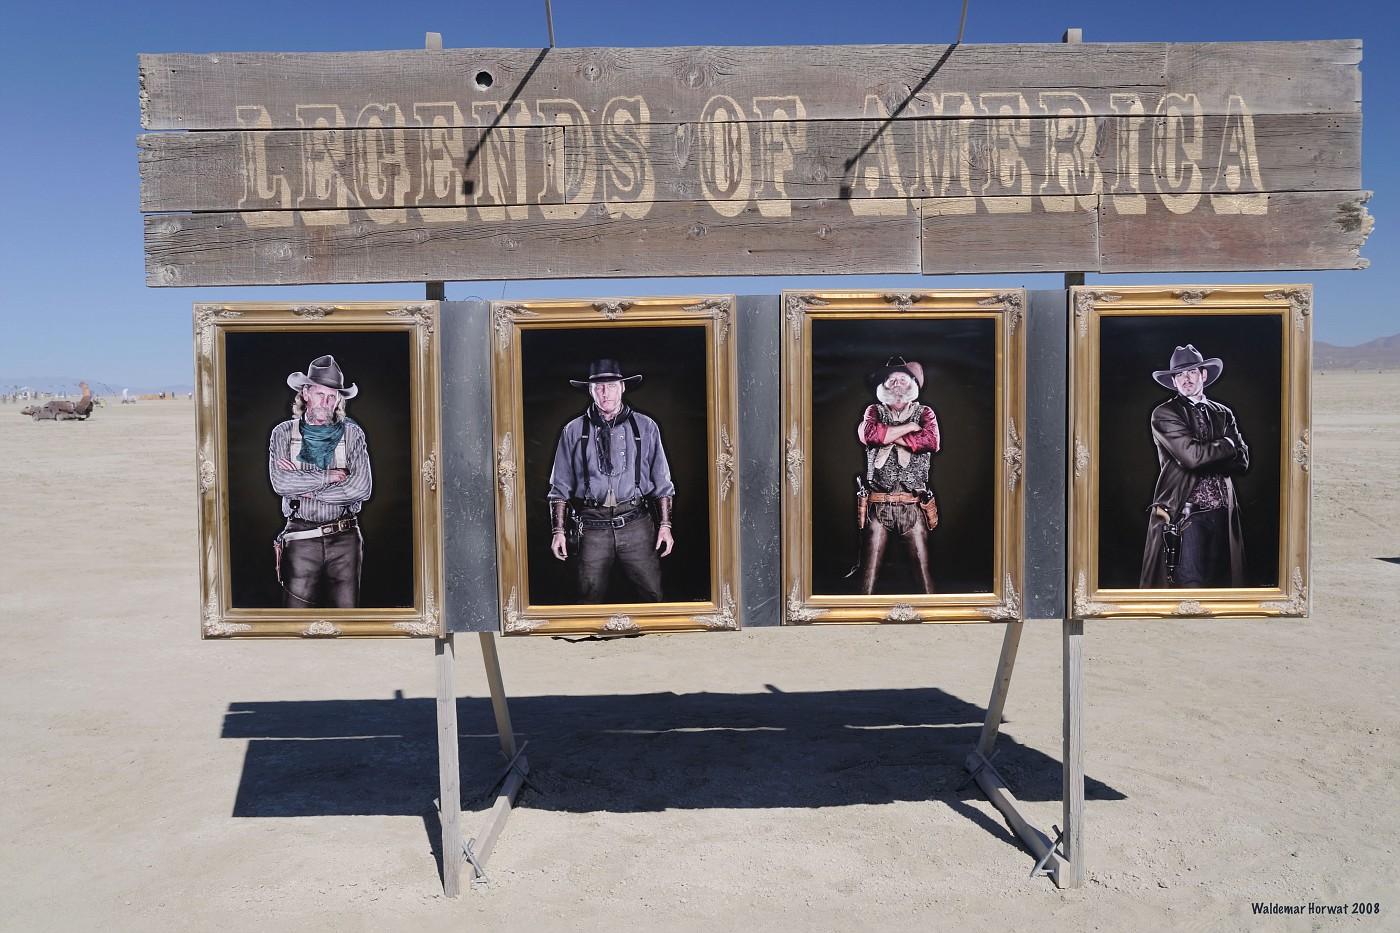 Legends of America 2